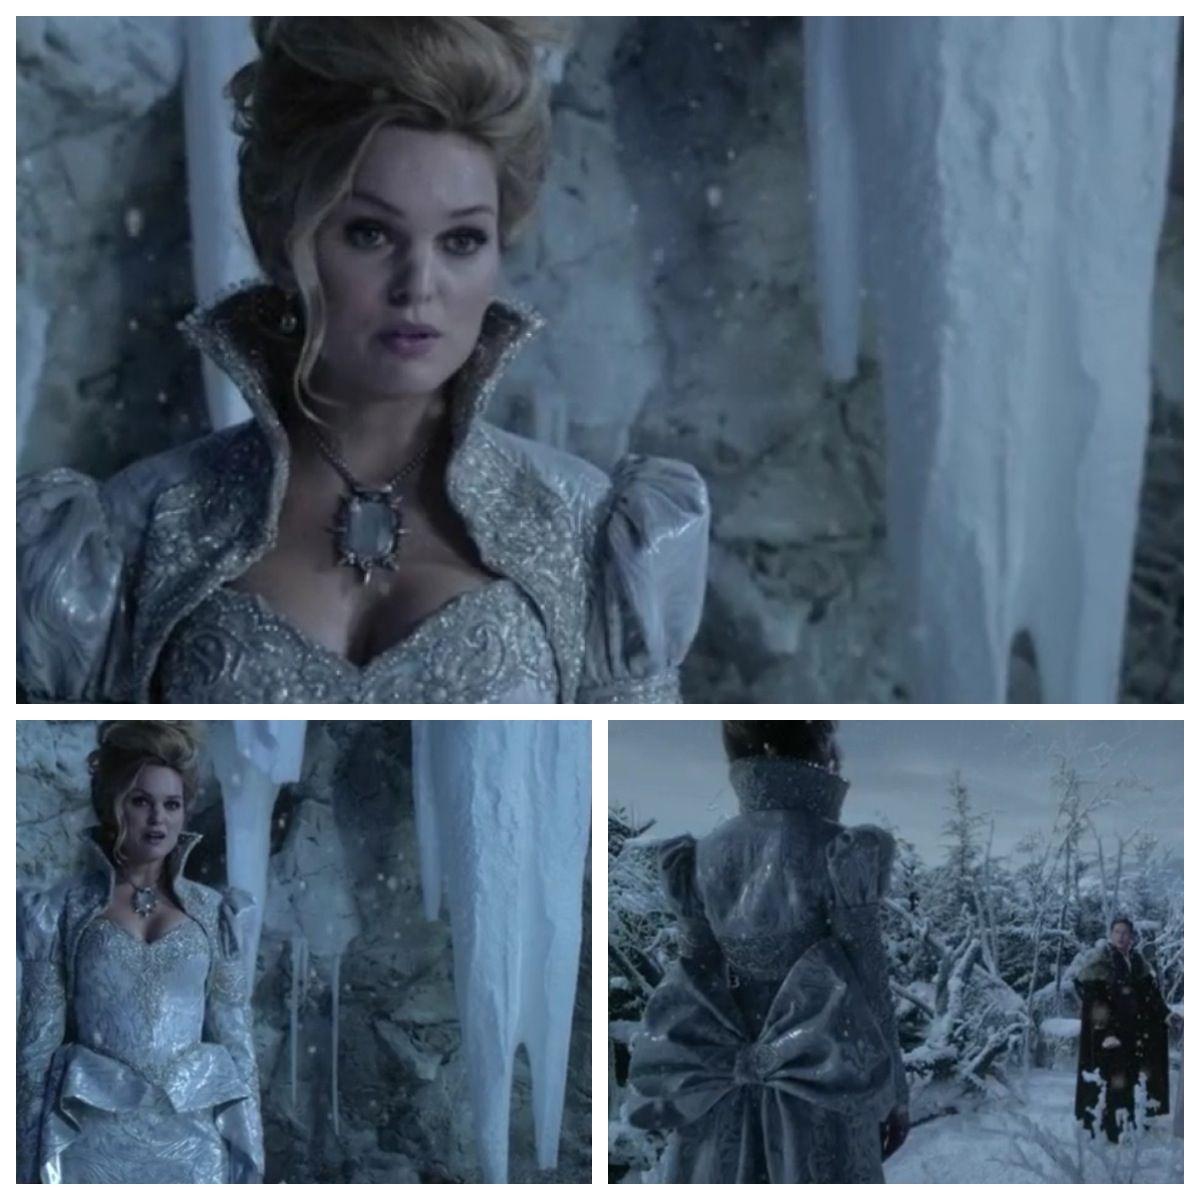 Dress Glinda - Once upon a time